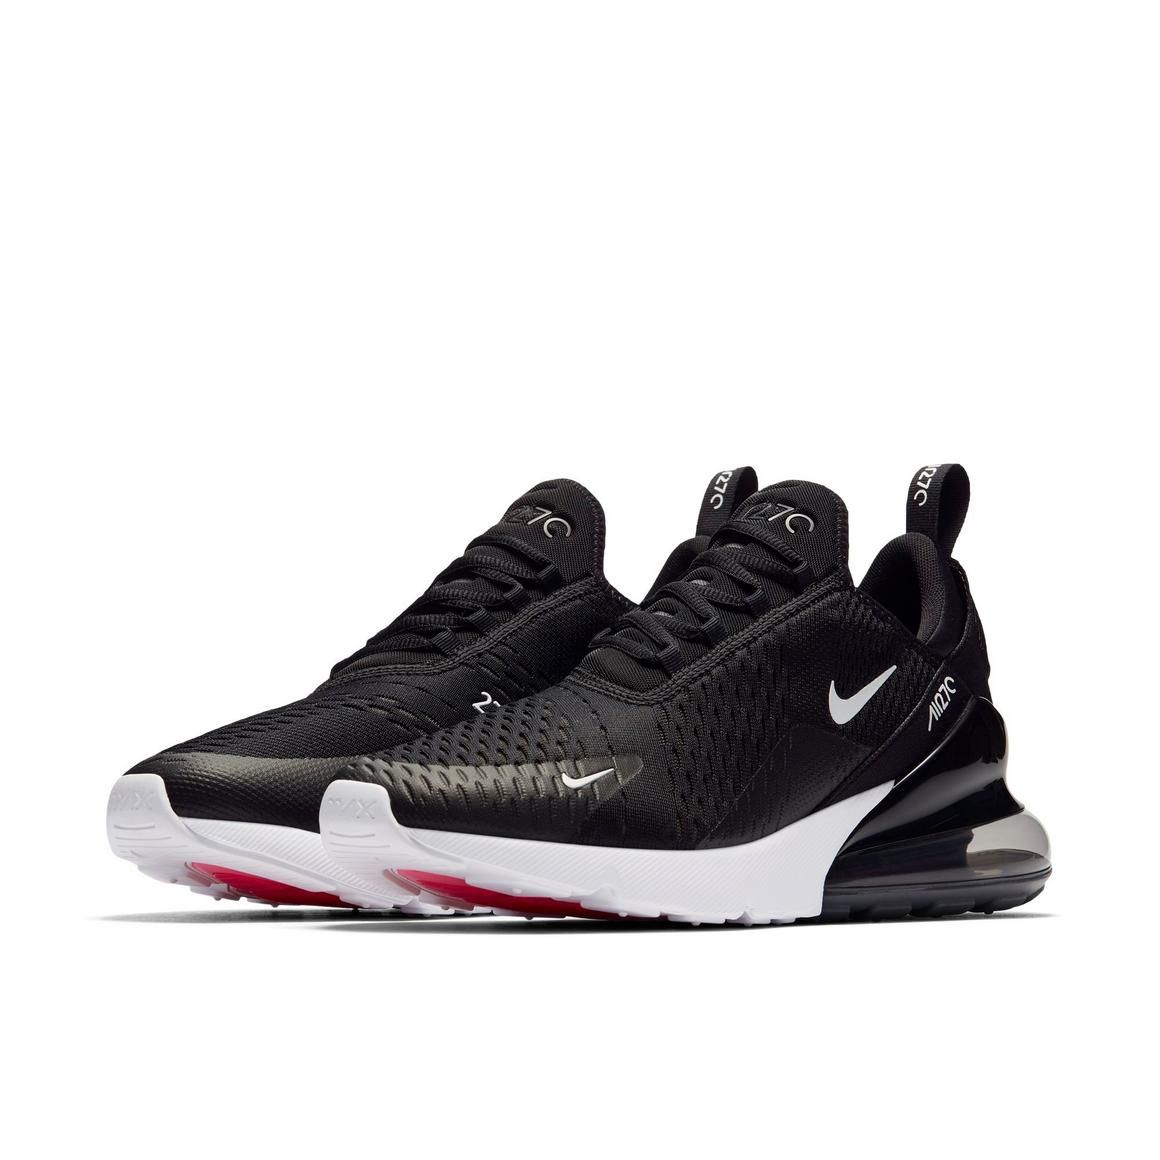 "Nike Air Max 270 ""Black/Anthracite"" Men's Shoe Nike"